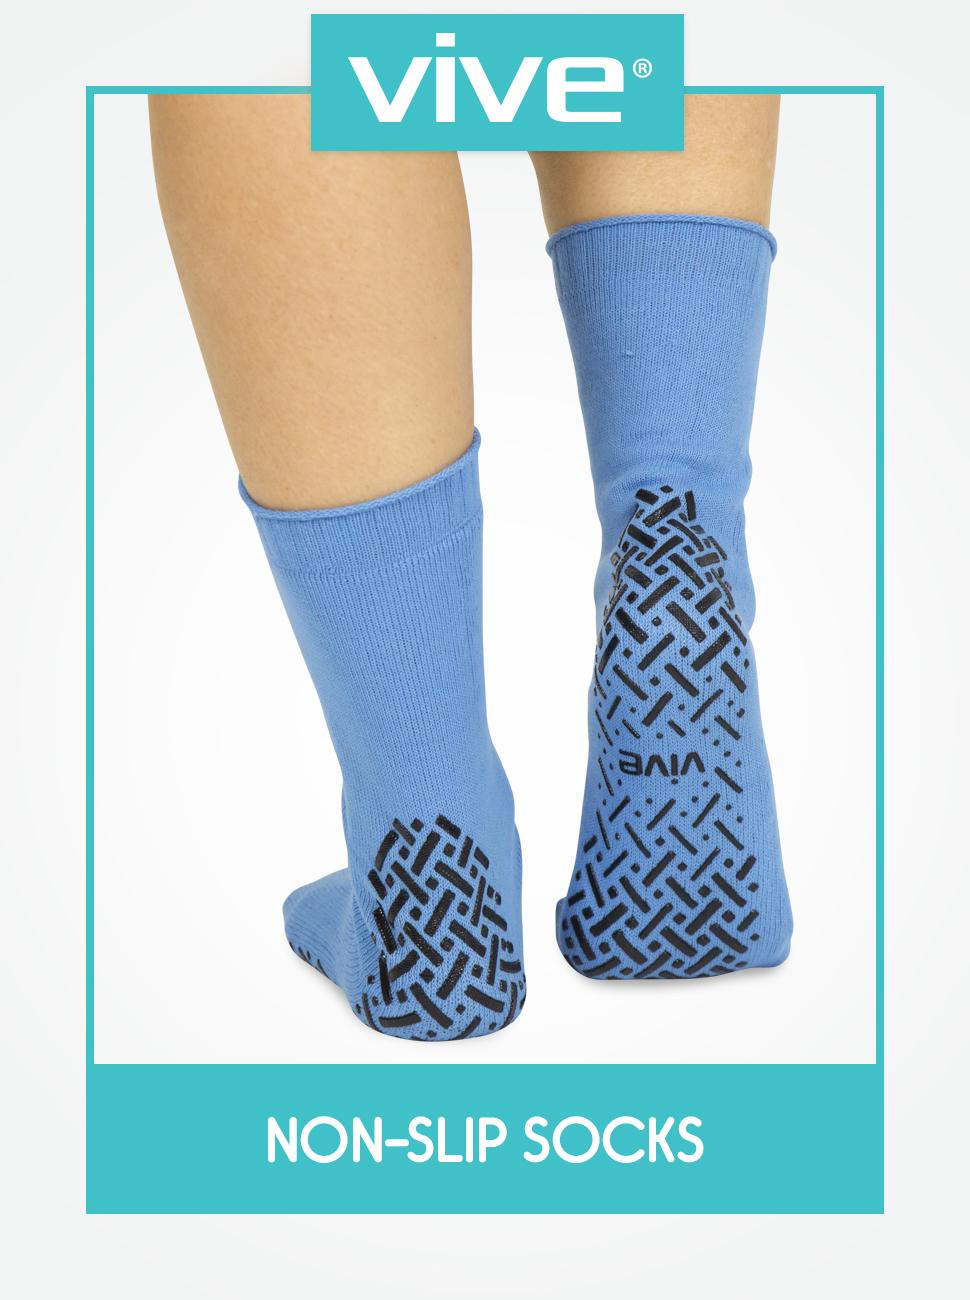 Hospital Socks Women Men Non Skid Gripper Cozy Socks 6 Pairs